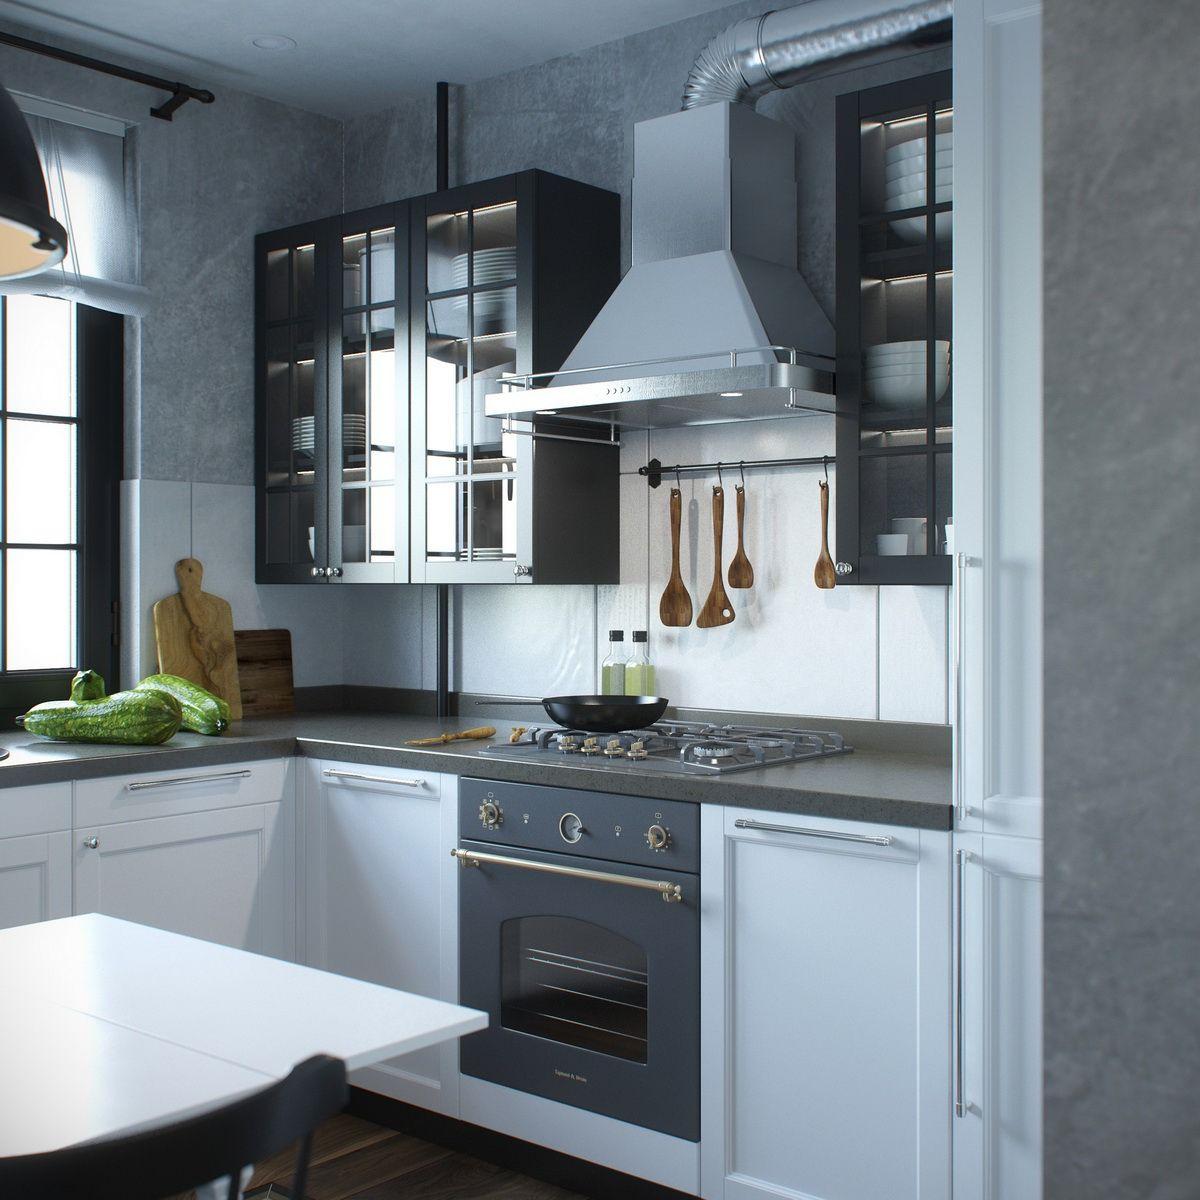 Visualization Kitchen Loft on Behance Visualization Kitchen